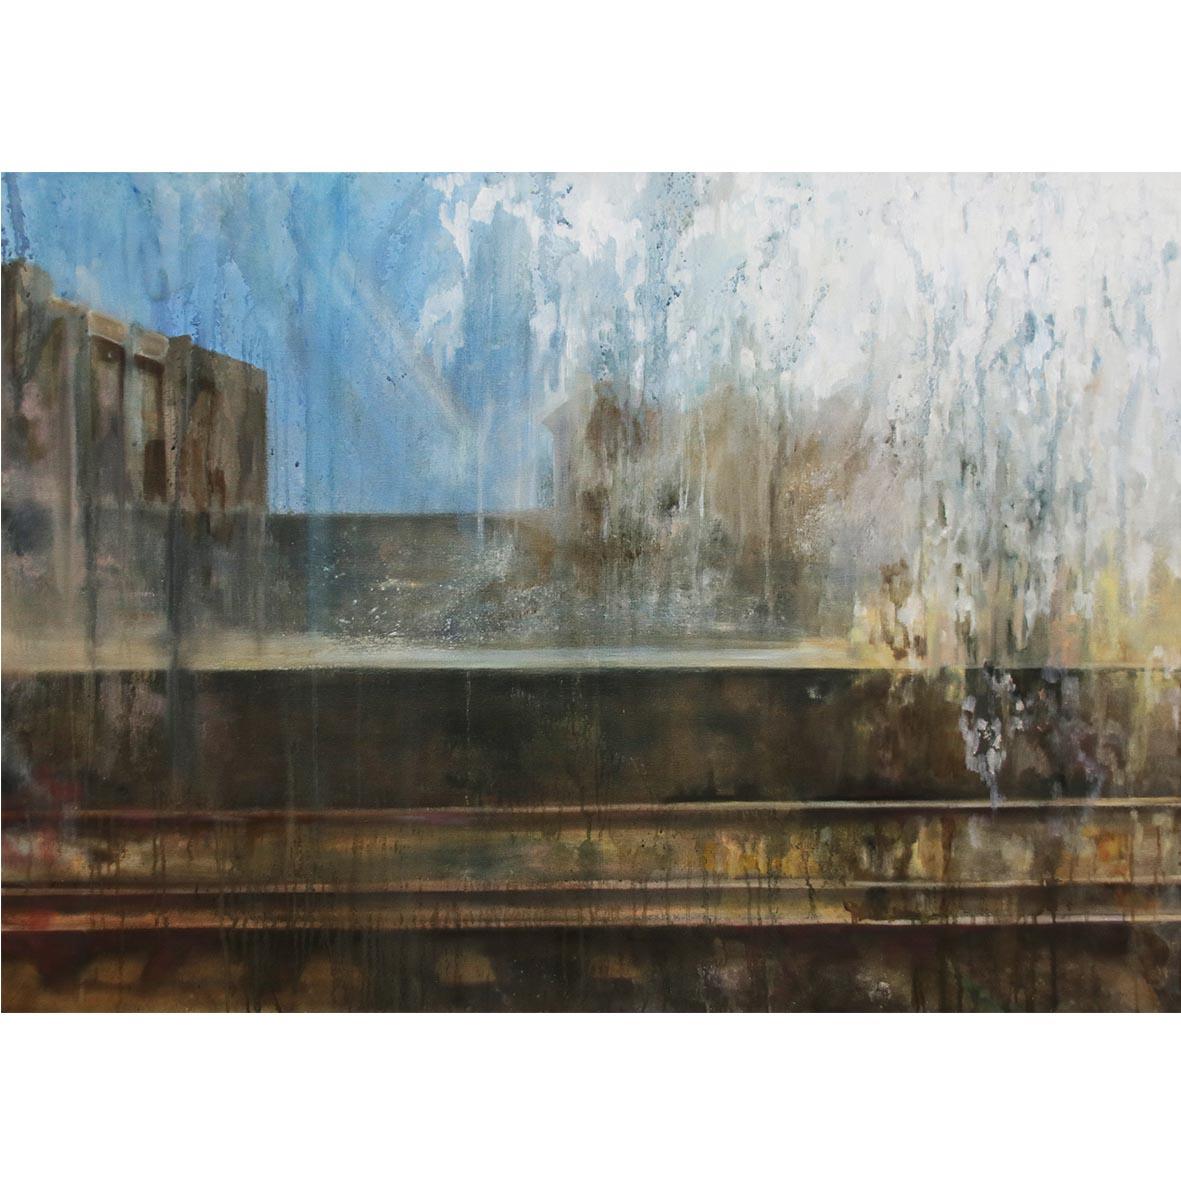 Desrae Chimes Saacks, Untitled I, 2018, oil on canvas, 85 x 120 cm